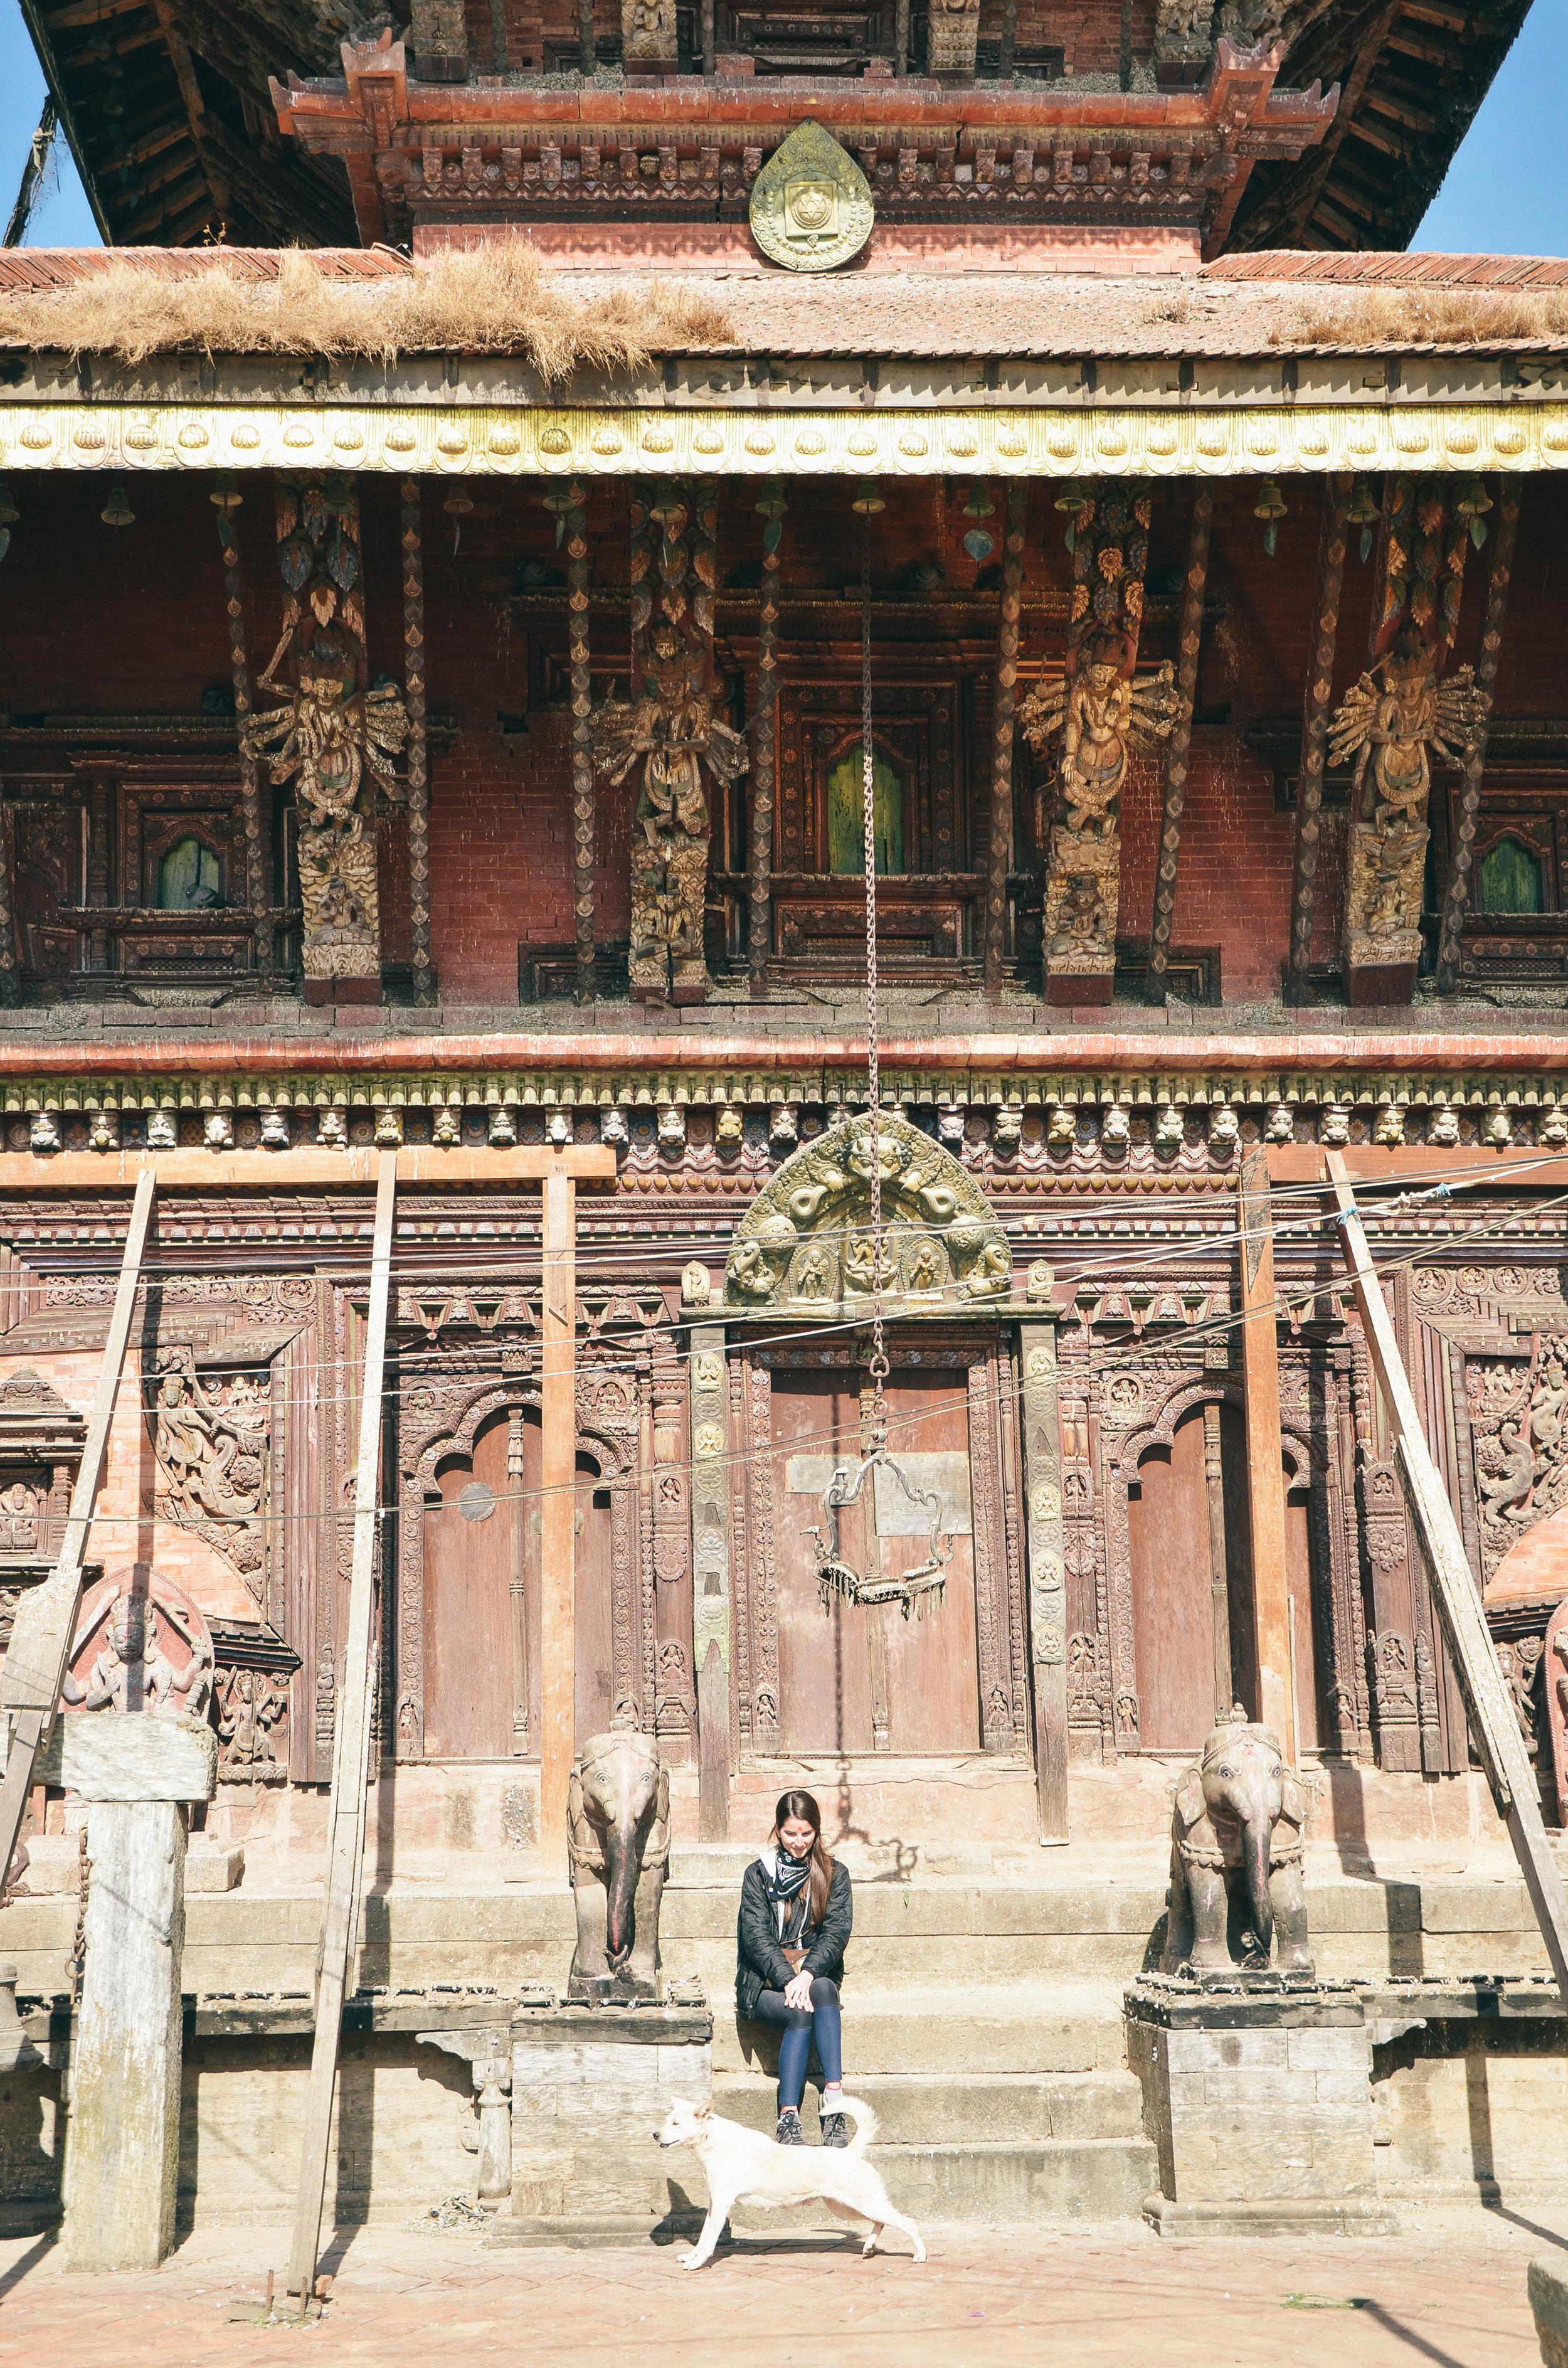 10-things-to-know-kathmandu-nepal-lifeonpine_DSC_0638.jpg